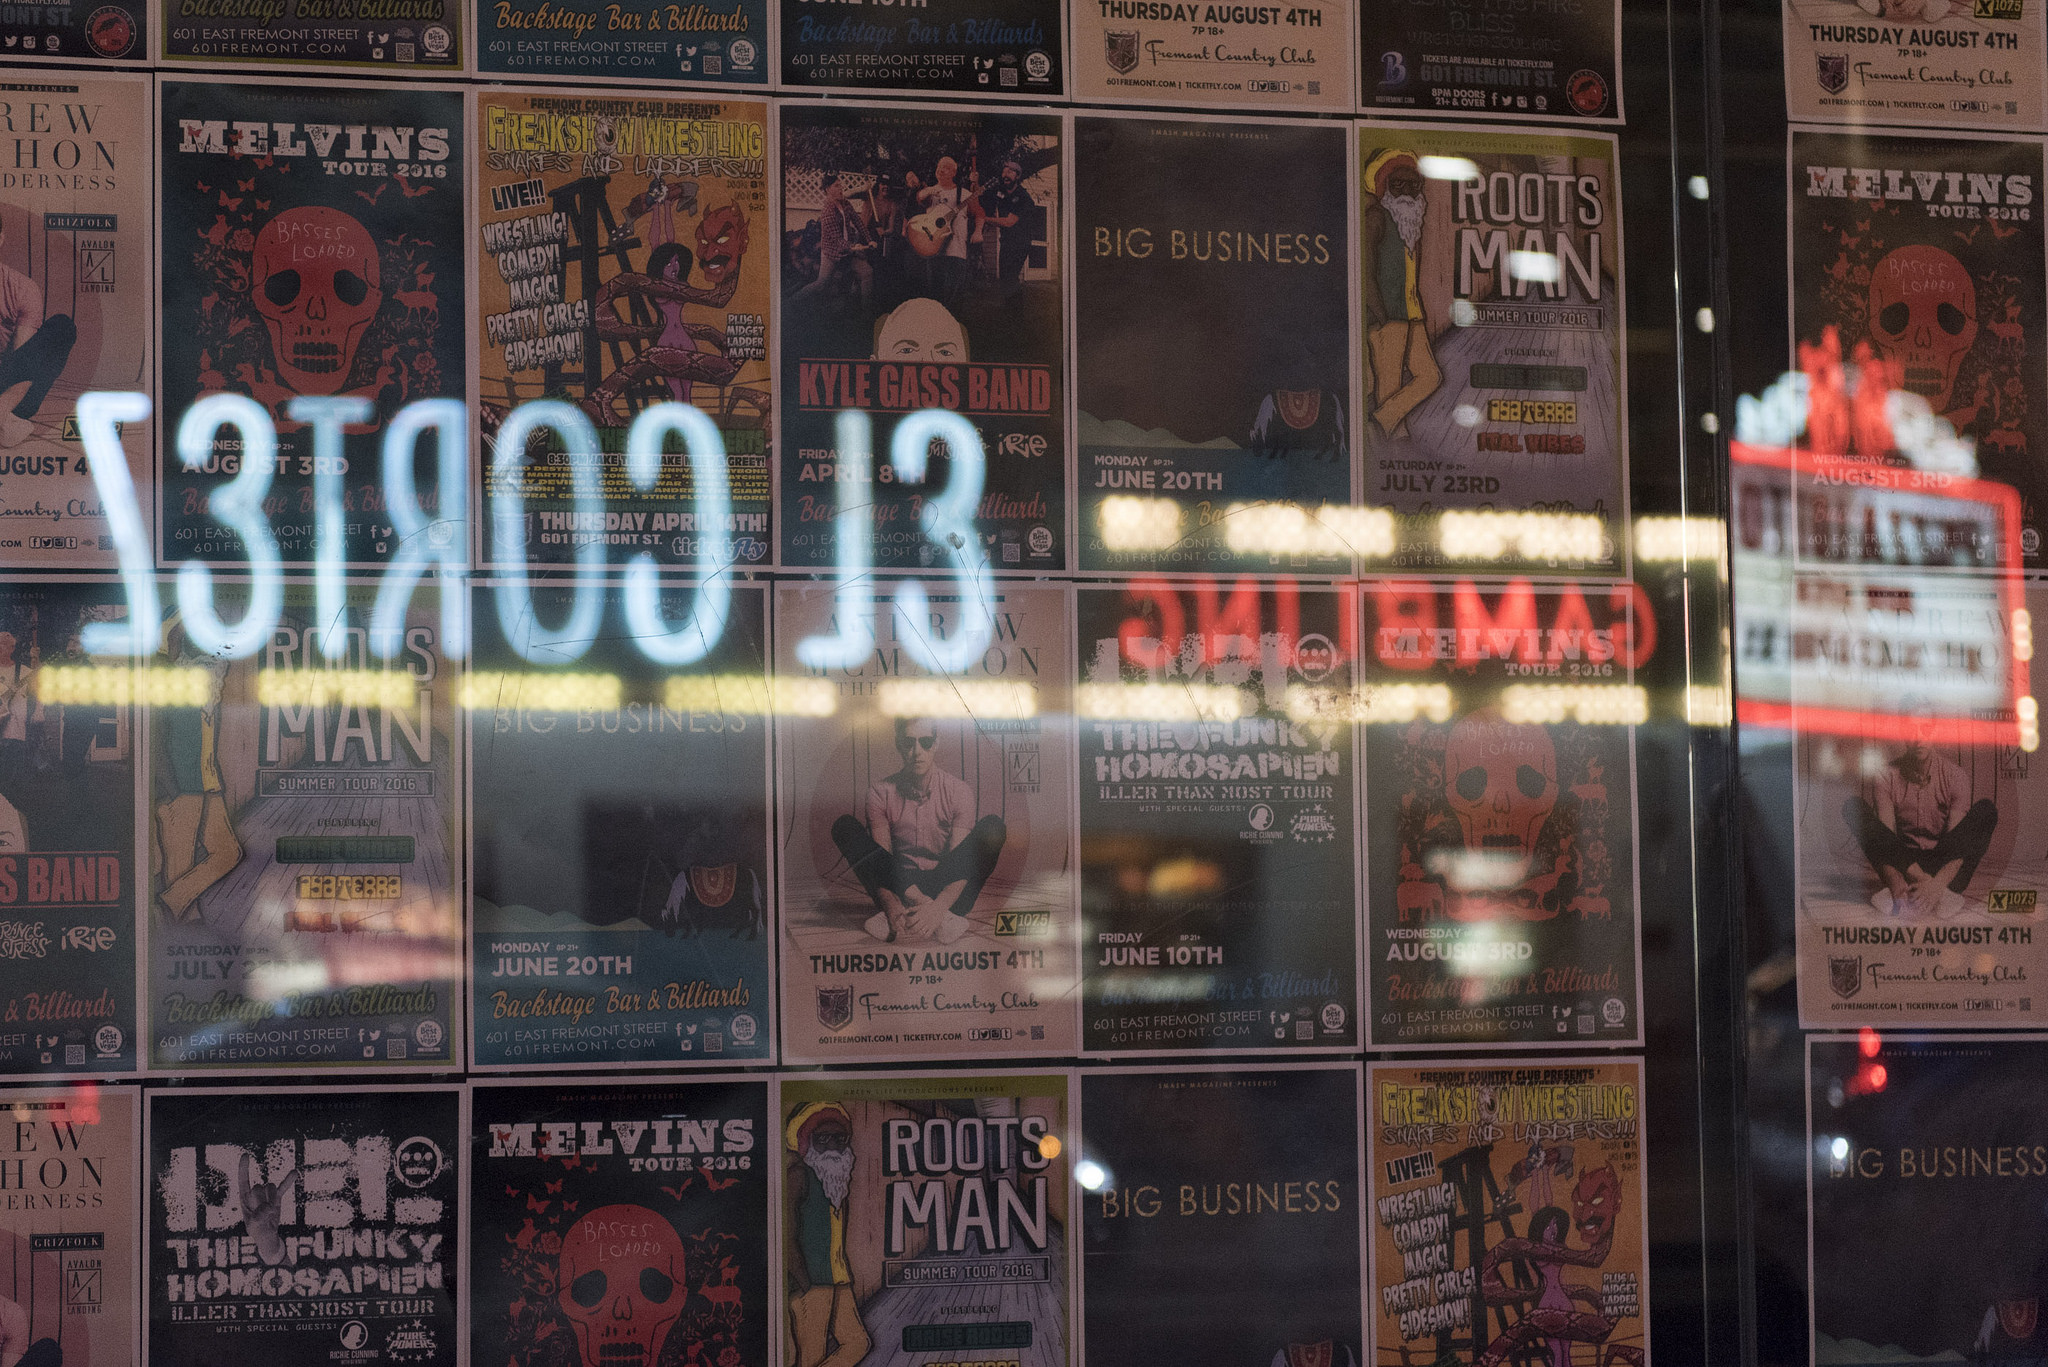 Concert posters line the window of Backstage Bar & Billiards at 601 Fremont St. in Las Vegas Friday, June 24, 2016. El Cortez hotel-casino is reflected on the window. Jason Ogulnik/Las Vegas Review-Journal